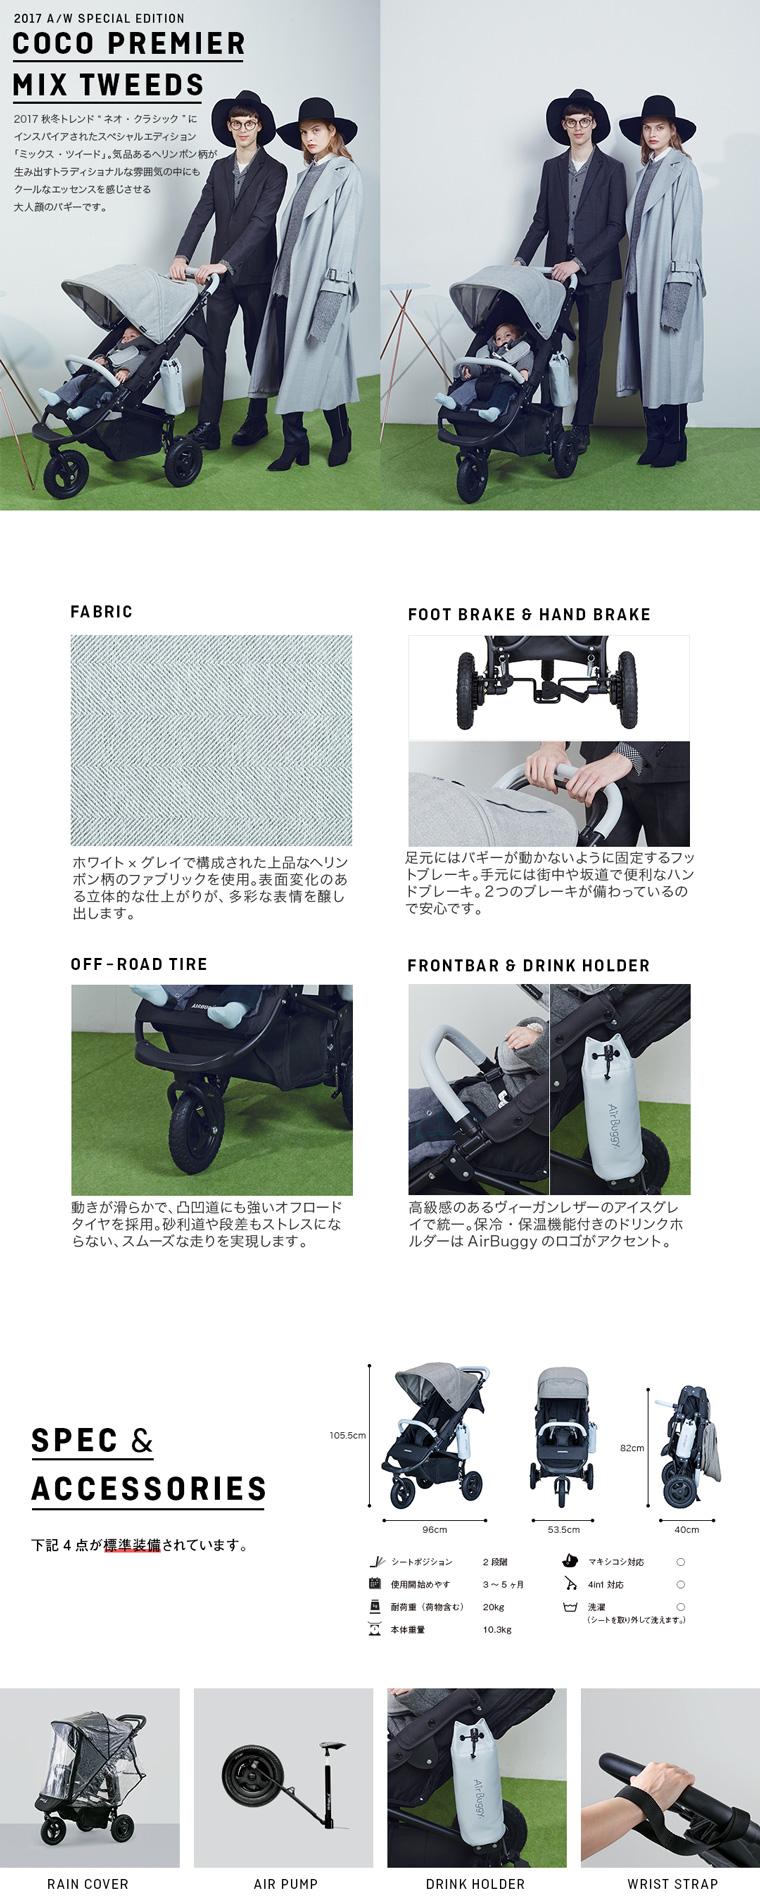 airbuggy-coco-premier-MIX-TWEEDS-info01